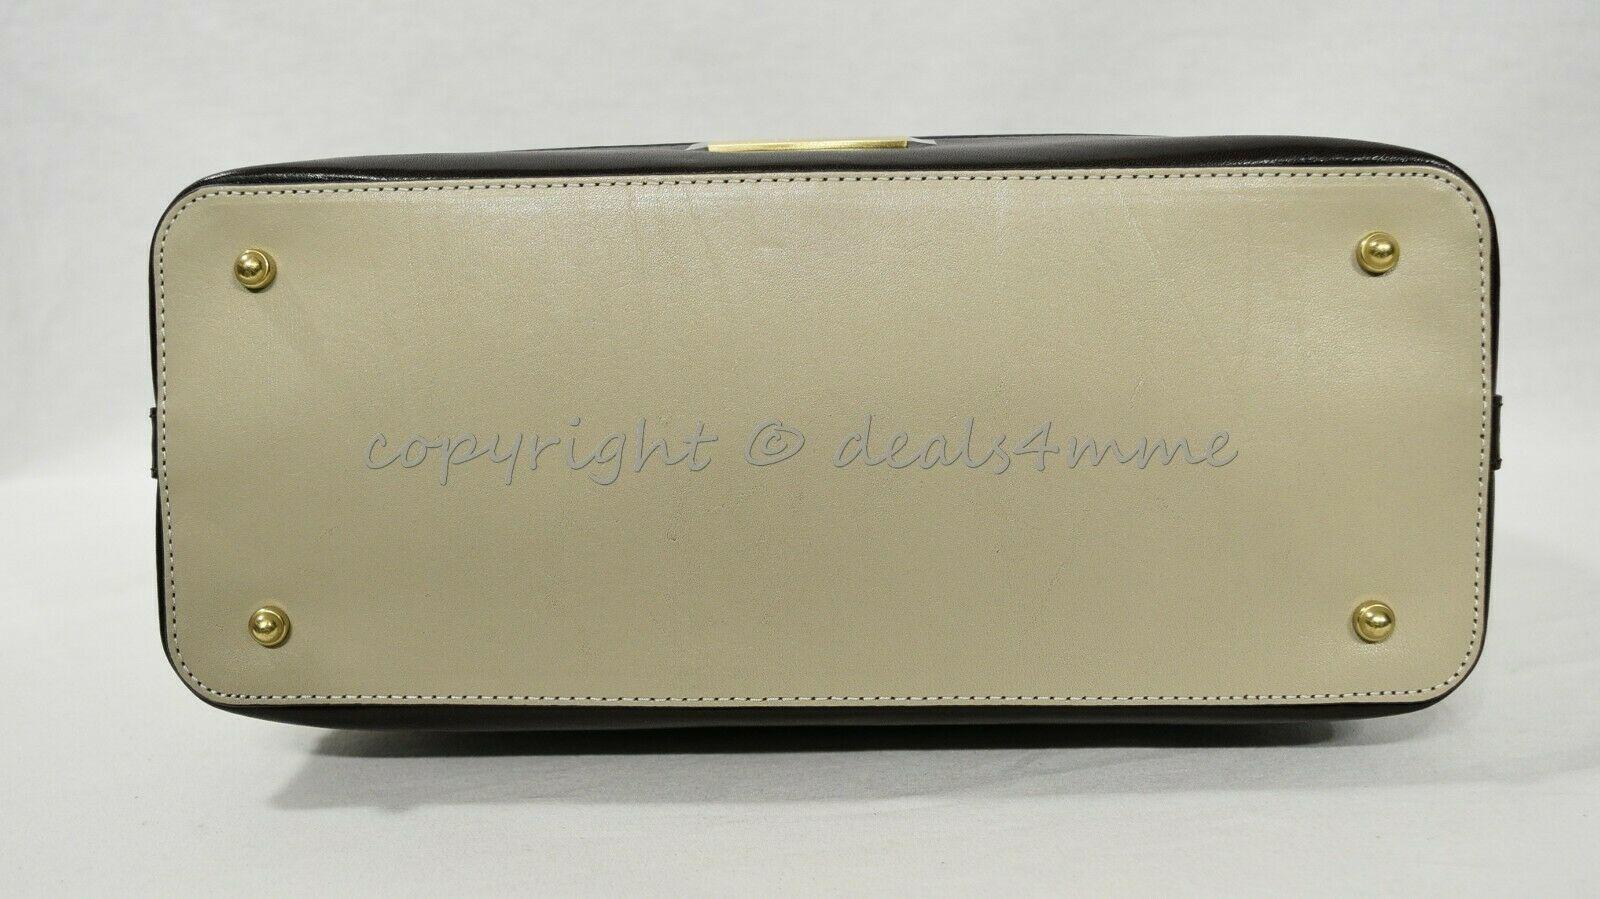 NWT Brahmin Large Duxbury Smooth Leather Satchel/Shoulder Bag in Sand Westport image 10